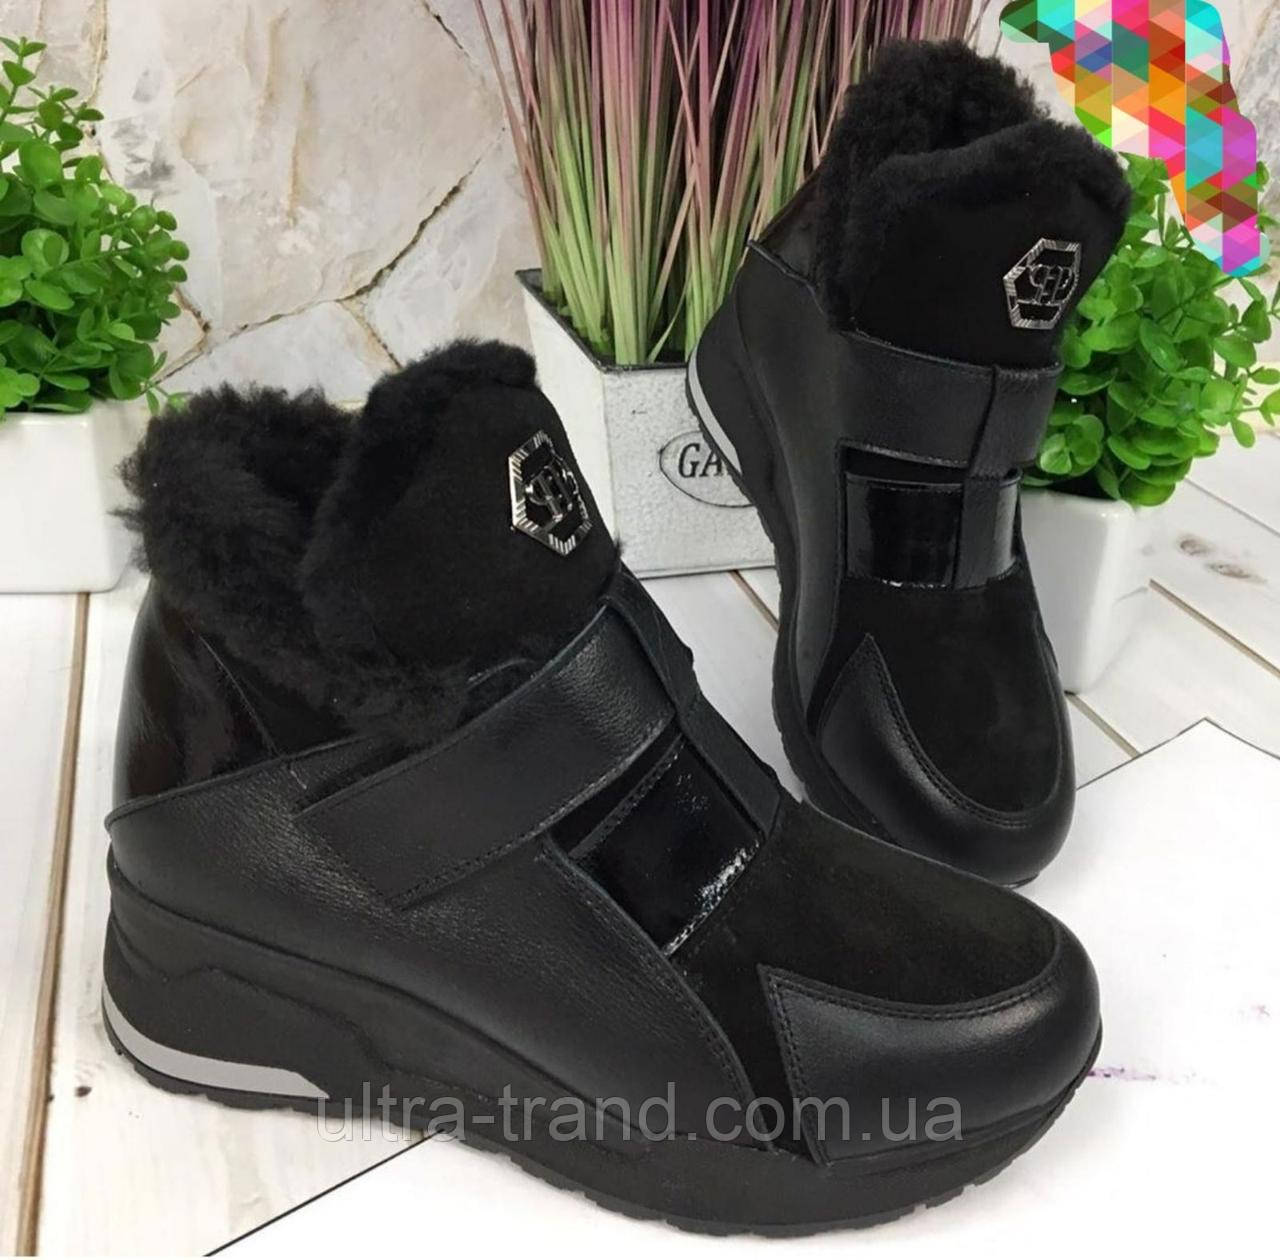 Philipp Plein зима! Женские ботинки с мехом кожа полуботинки Филипп плейн на танкетке с липучками